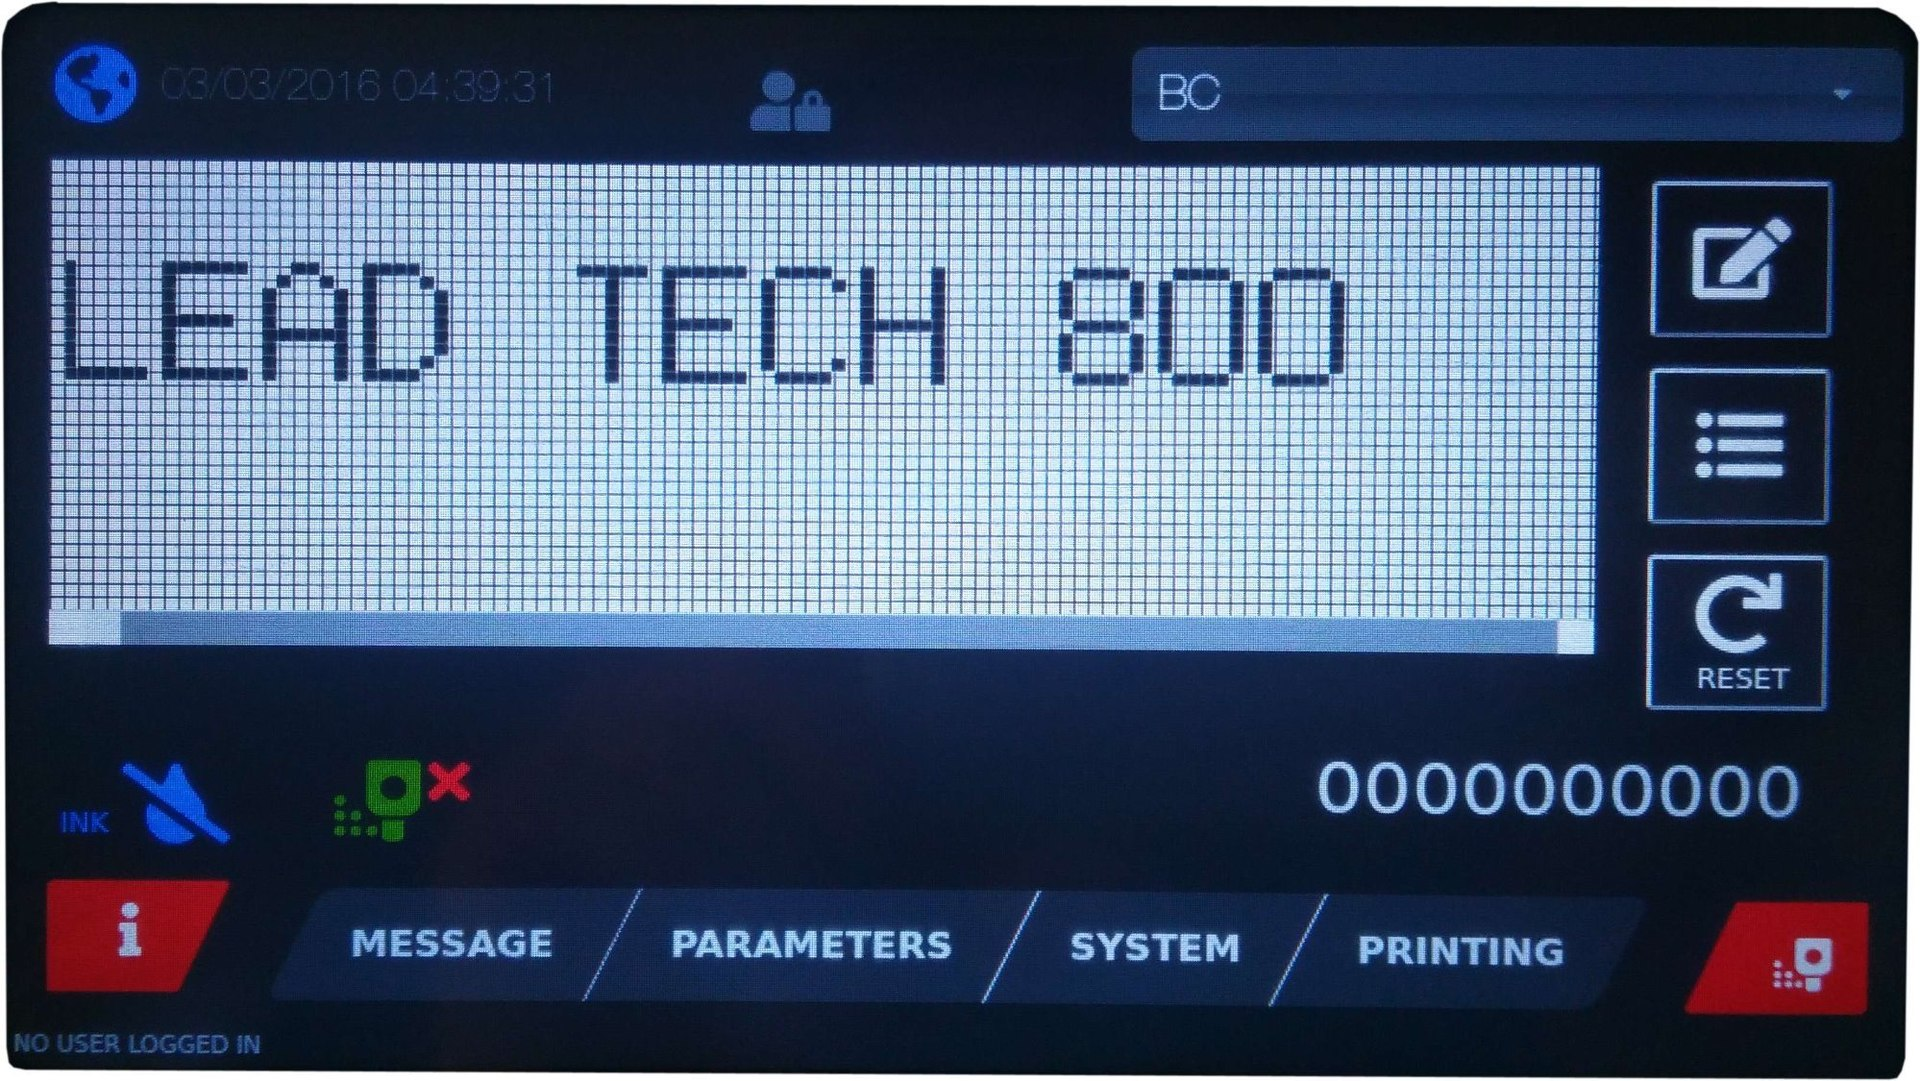 Lead Tech Lt800 Touch Screen Colorful Coding Cij Inkjet Printer